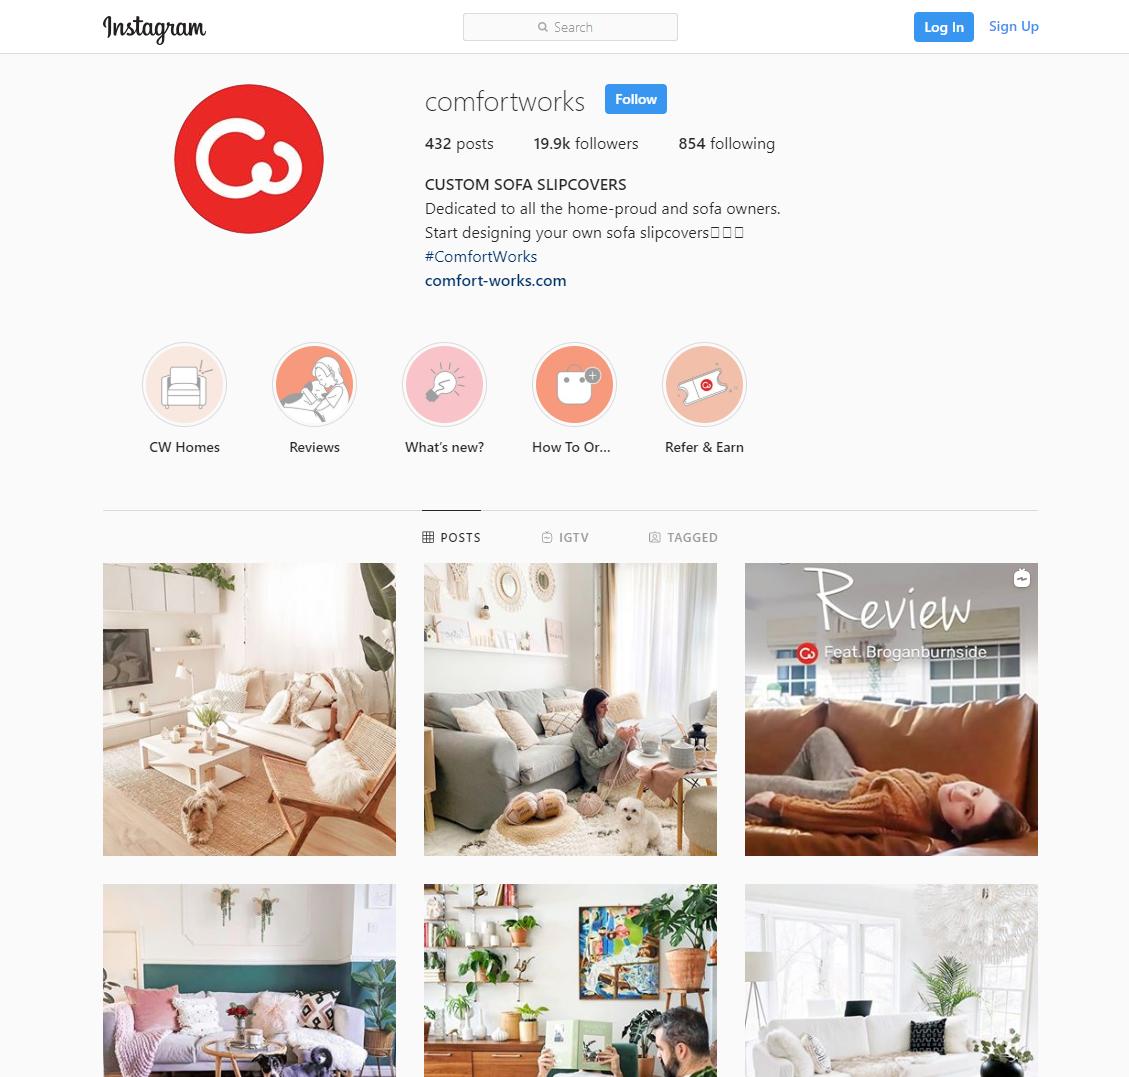 Comfort Works Instagram page